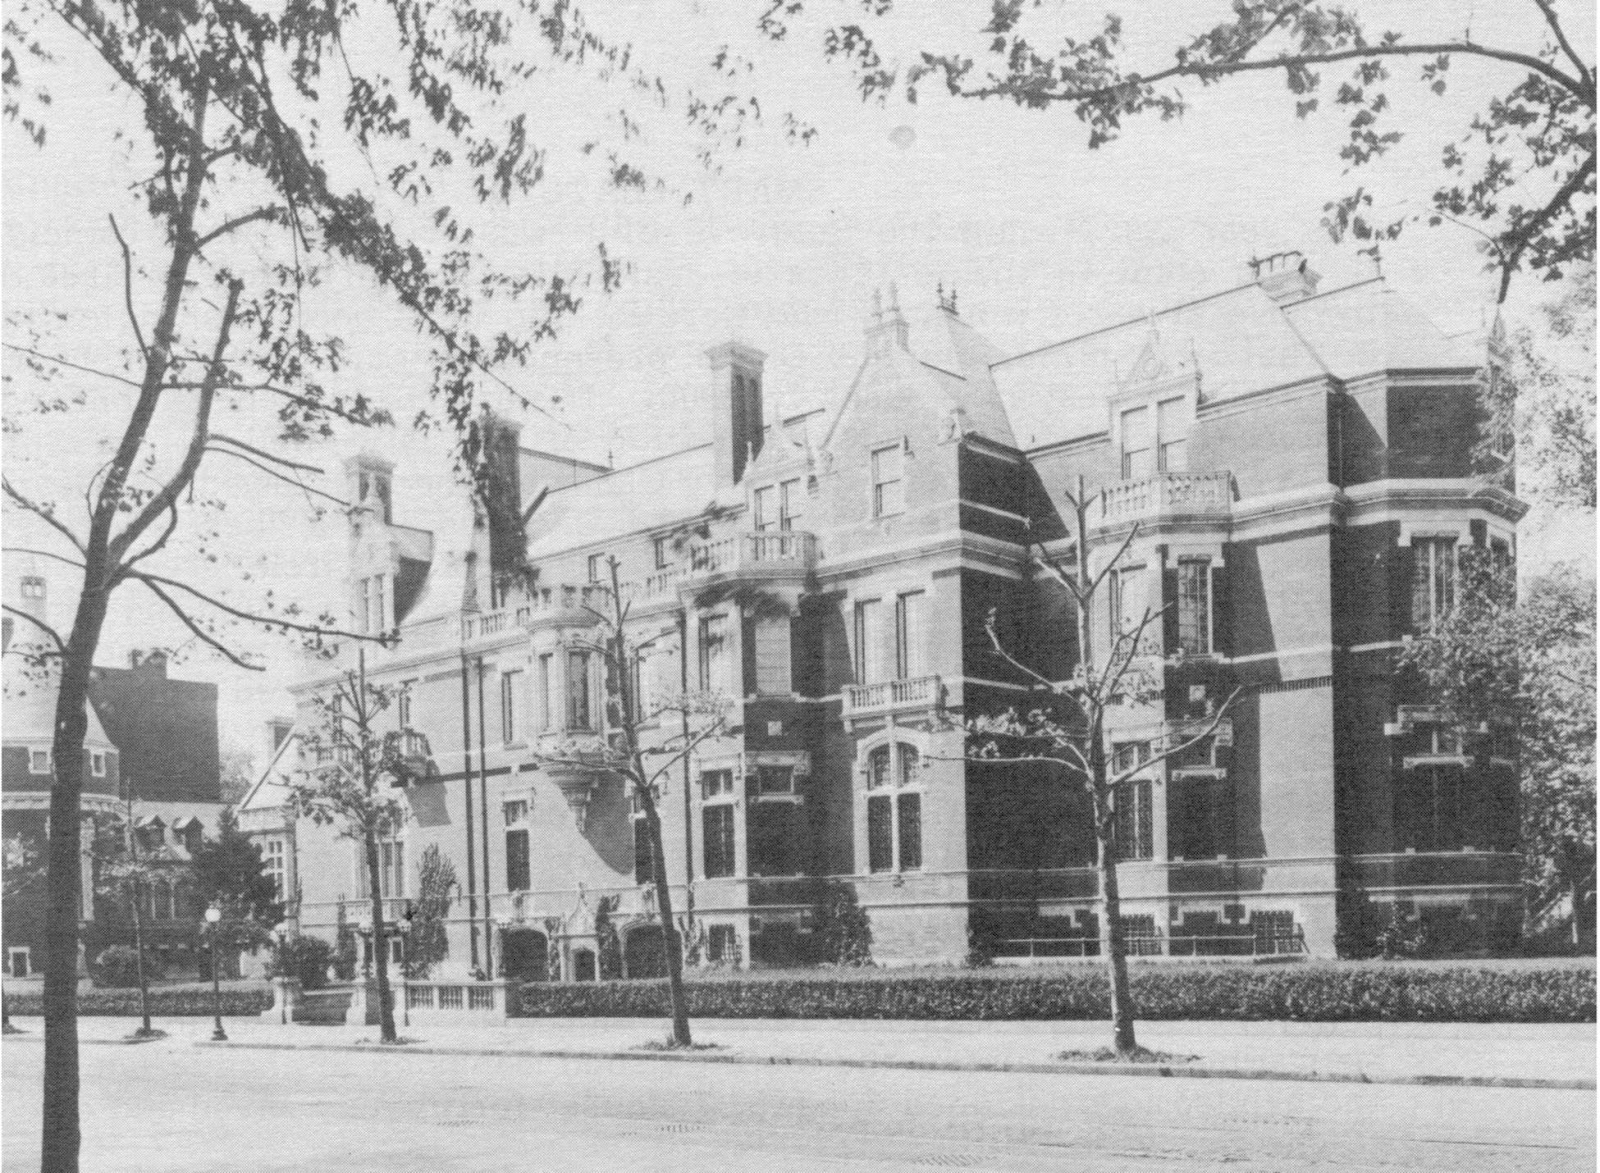 The bradley mansion on dupont circle